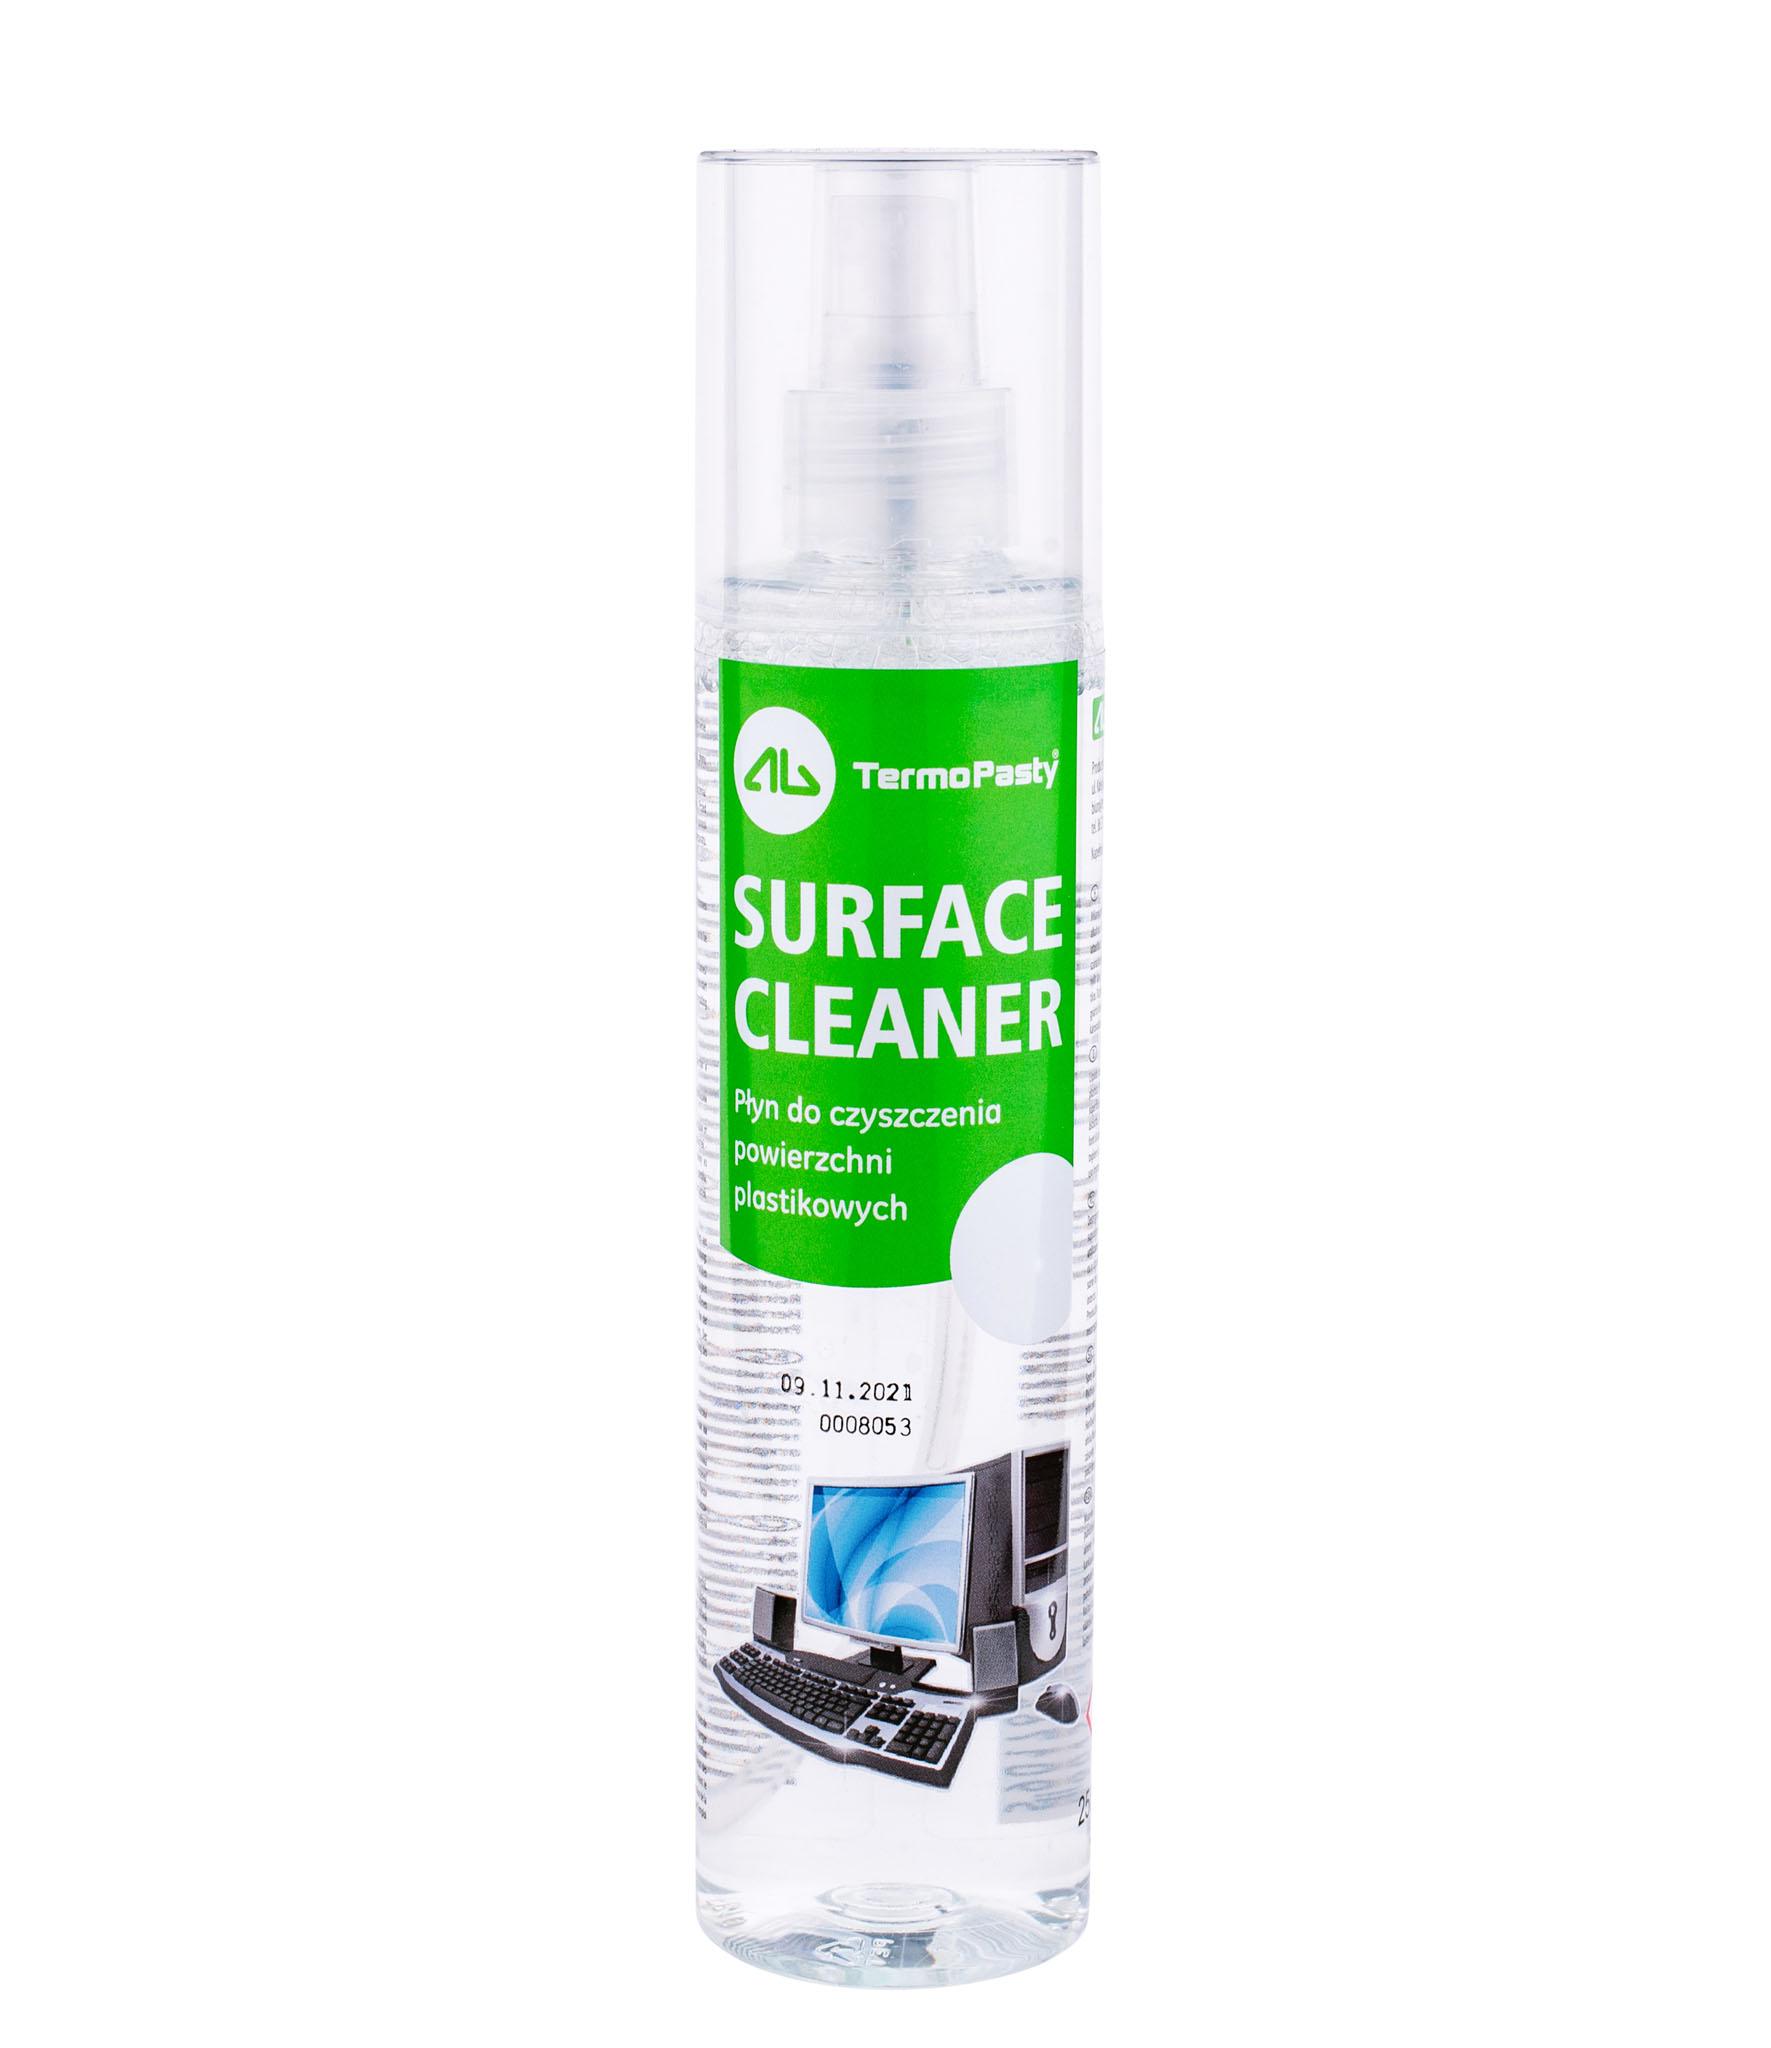 surface-cleaner-1.jpg